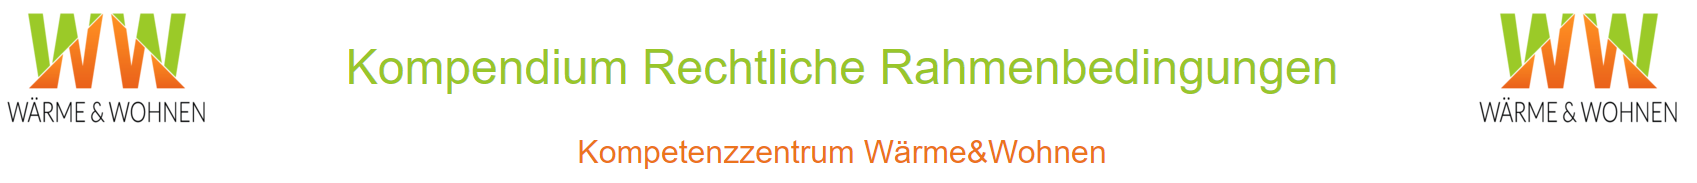 2019-07-02 14-23-15_W&W_Rechtskompendium